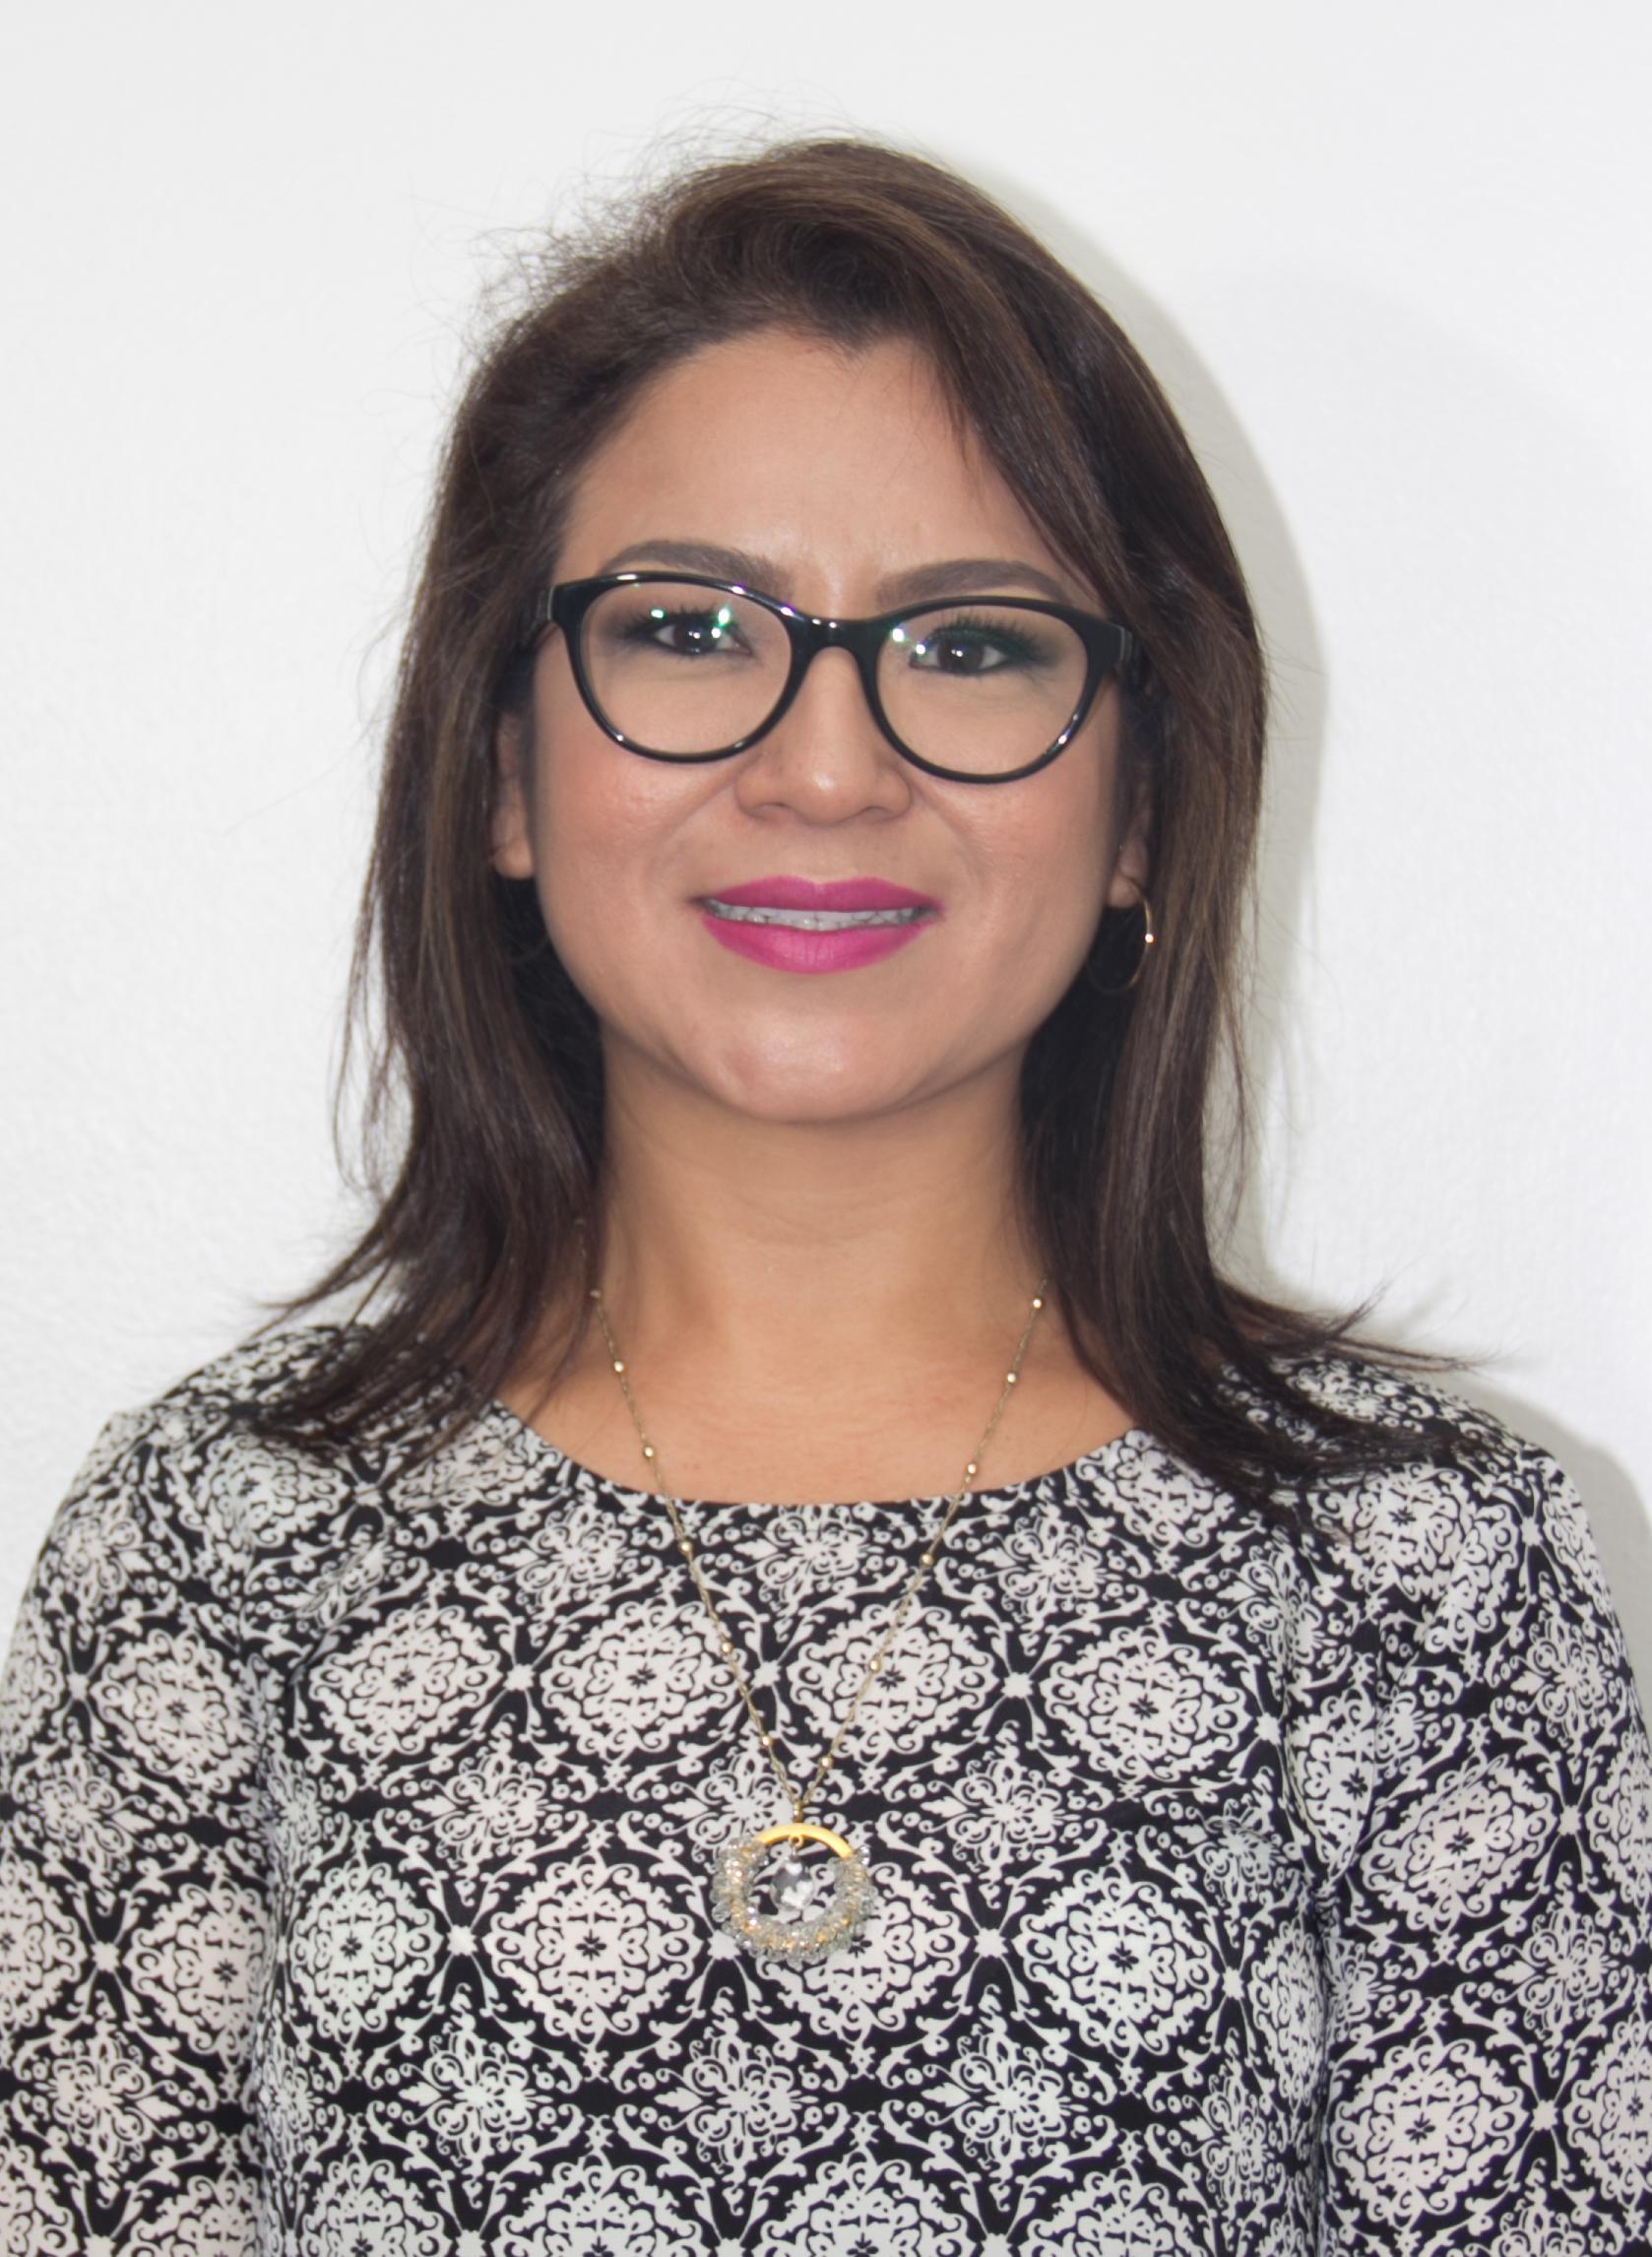 Dra. Zayda Elizabeth Jovel Aguilar